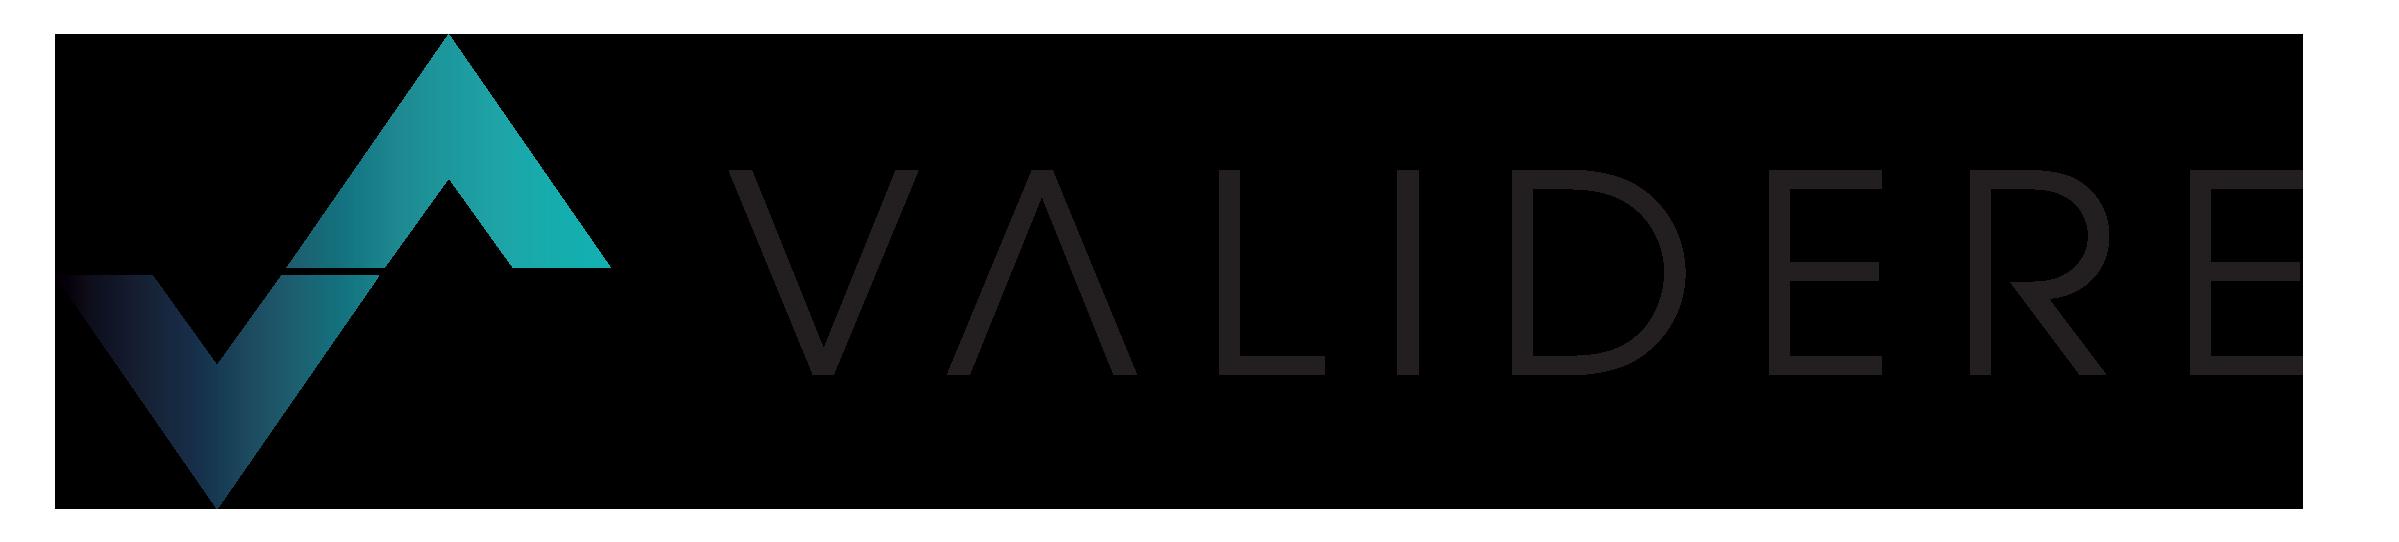 Validere logo